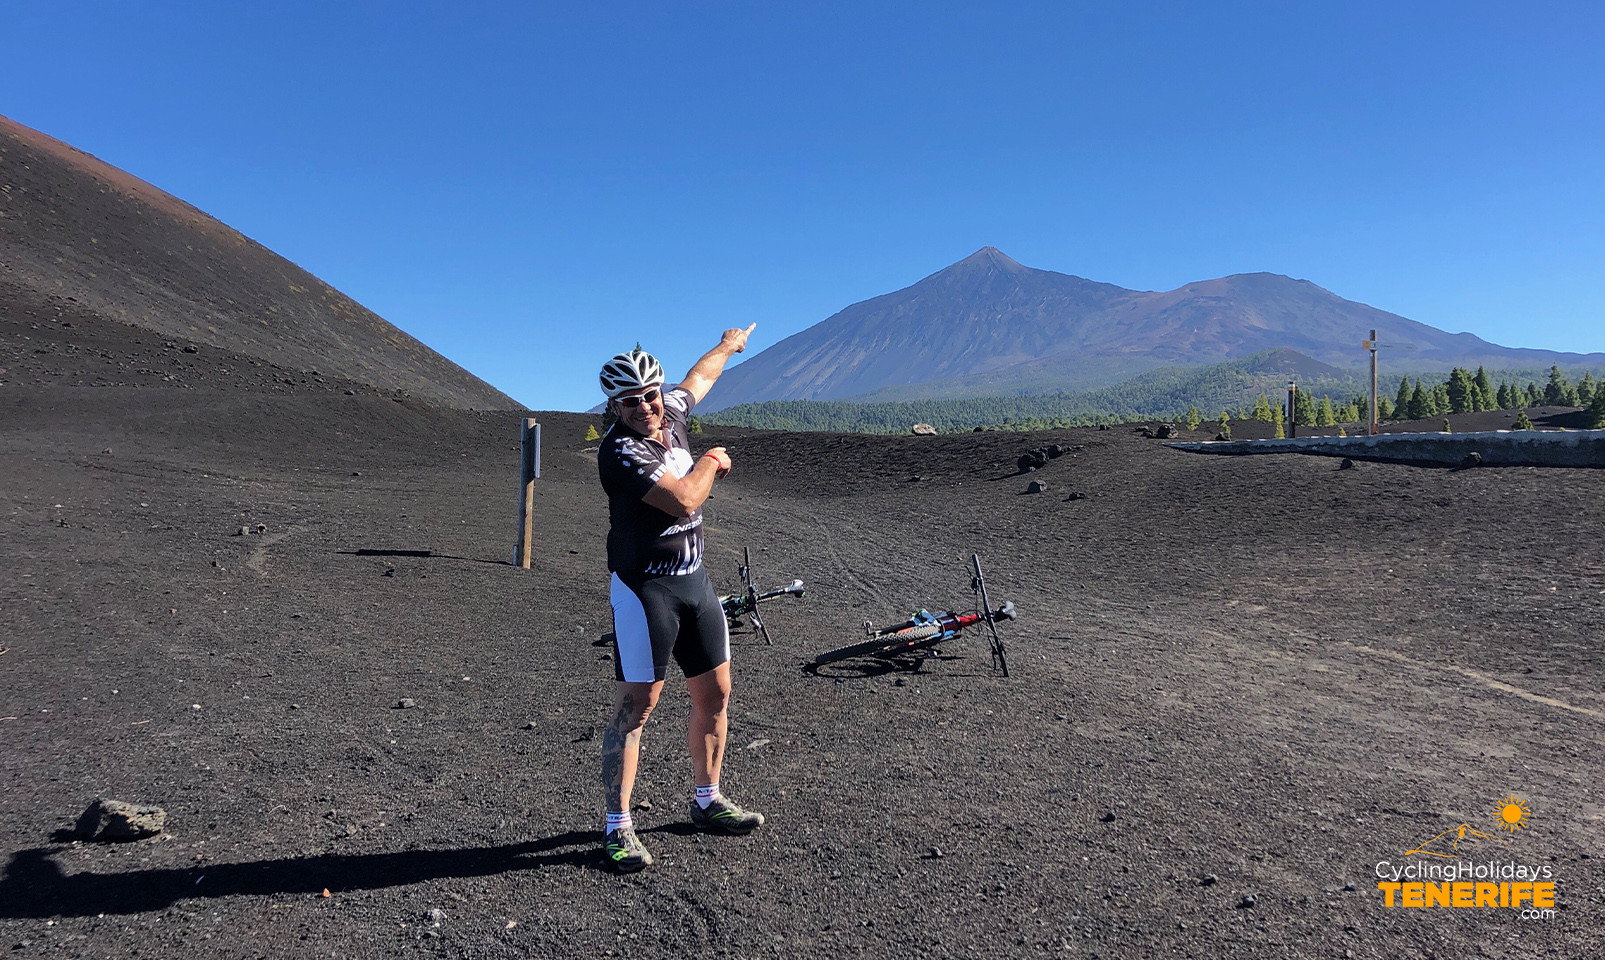 Copia de arena negra Tenerife MTB.jpg